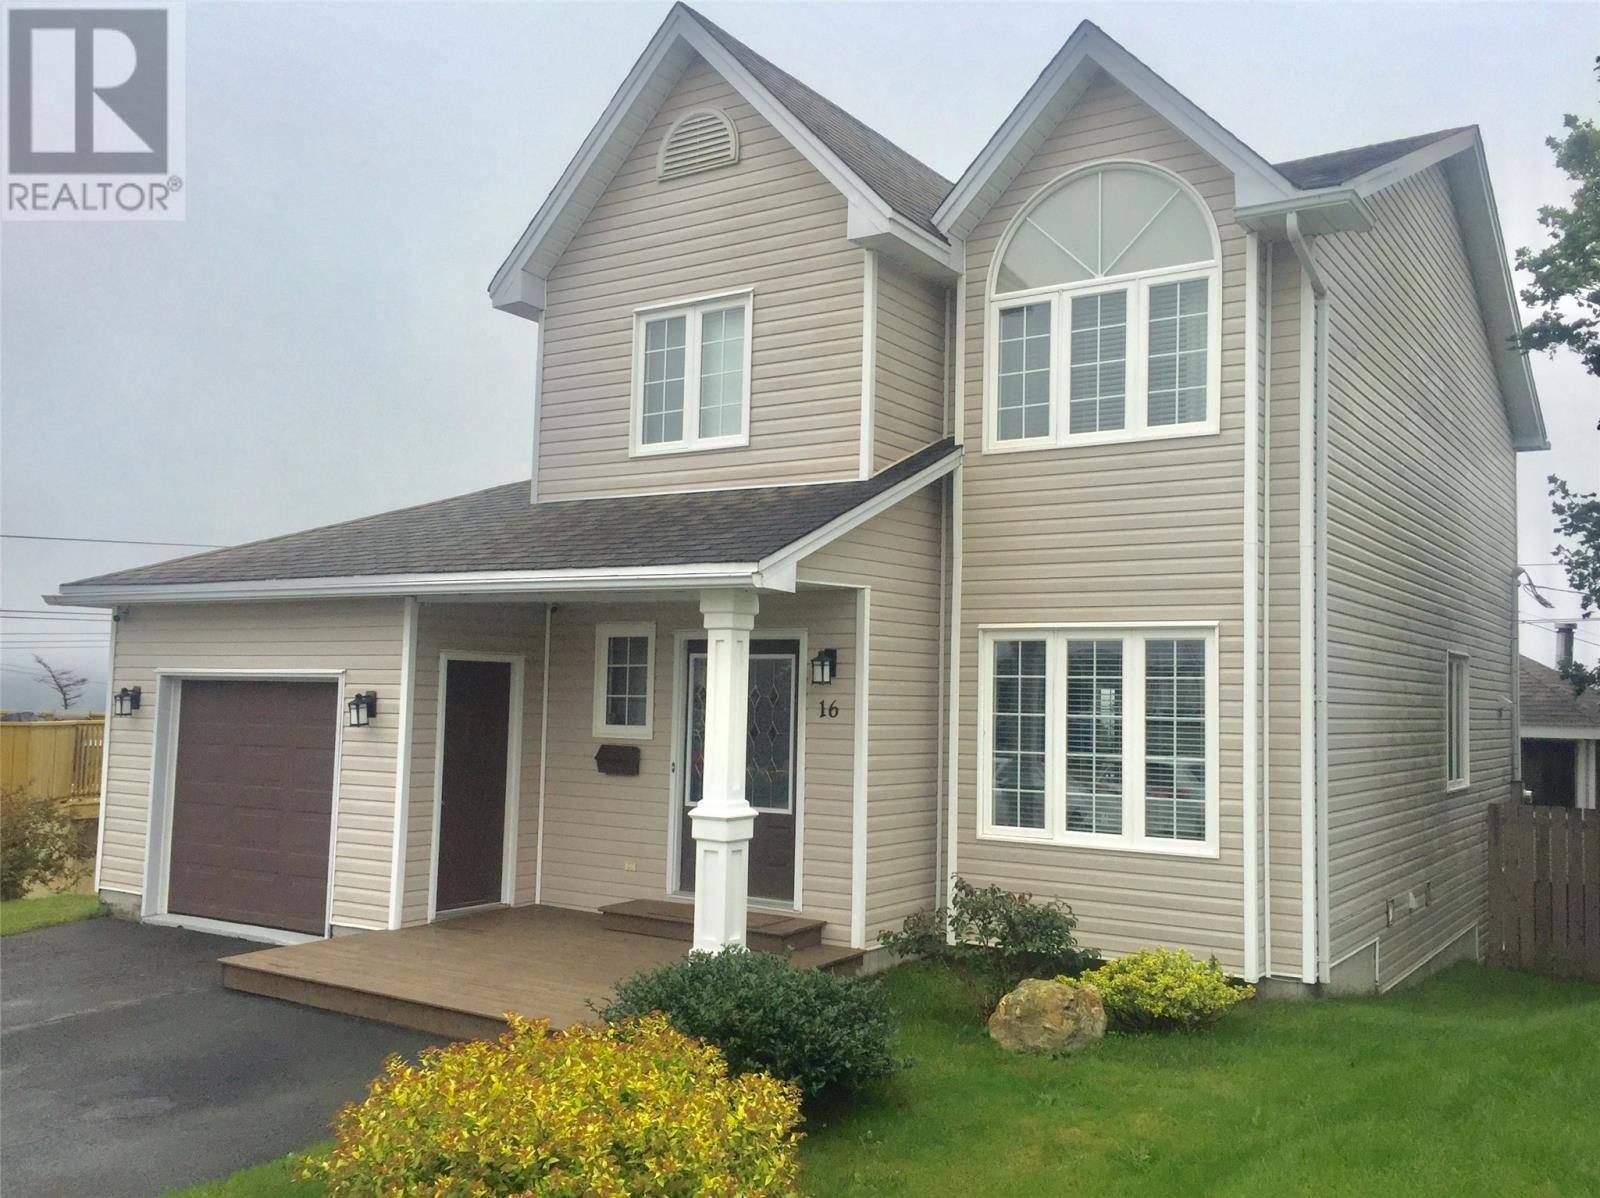 House for sale at 16 Burdell Pl St. John's Newfoundland - MLS: 1203200